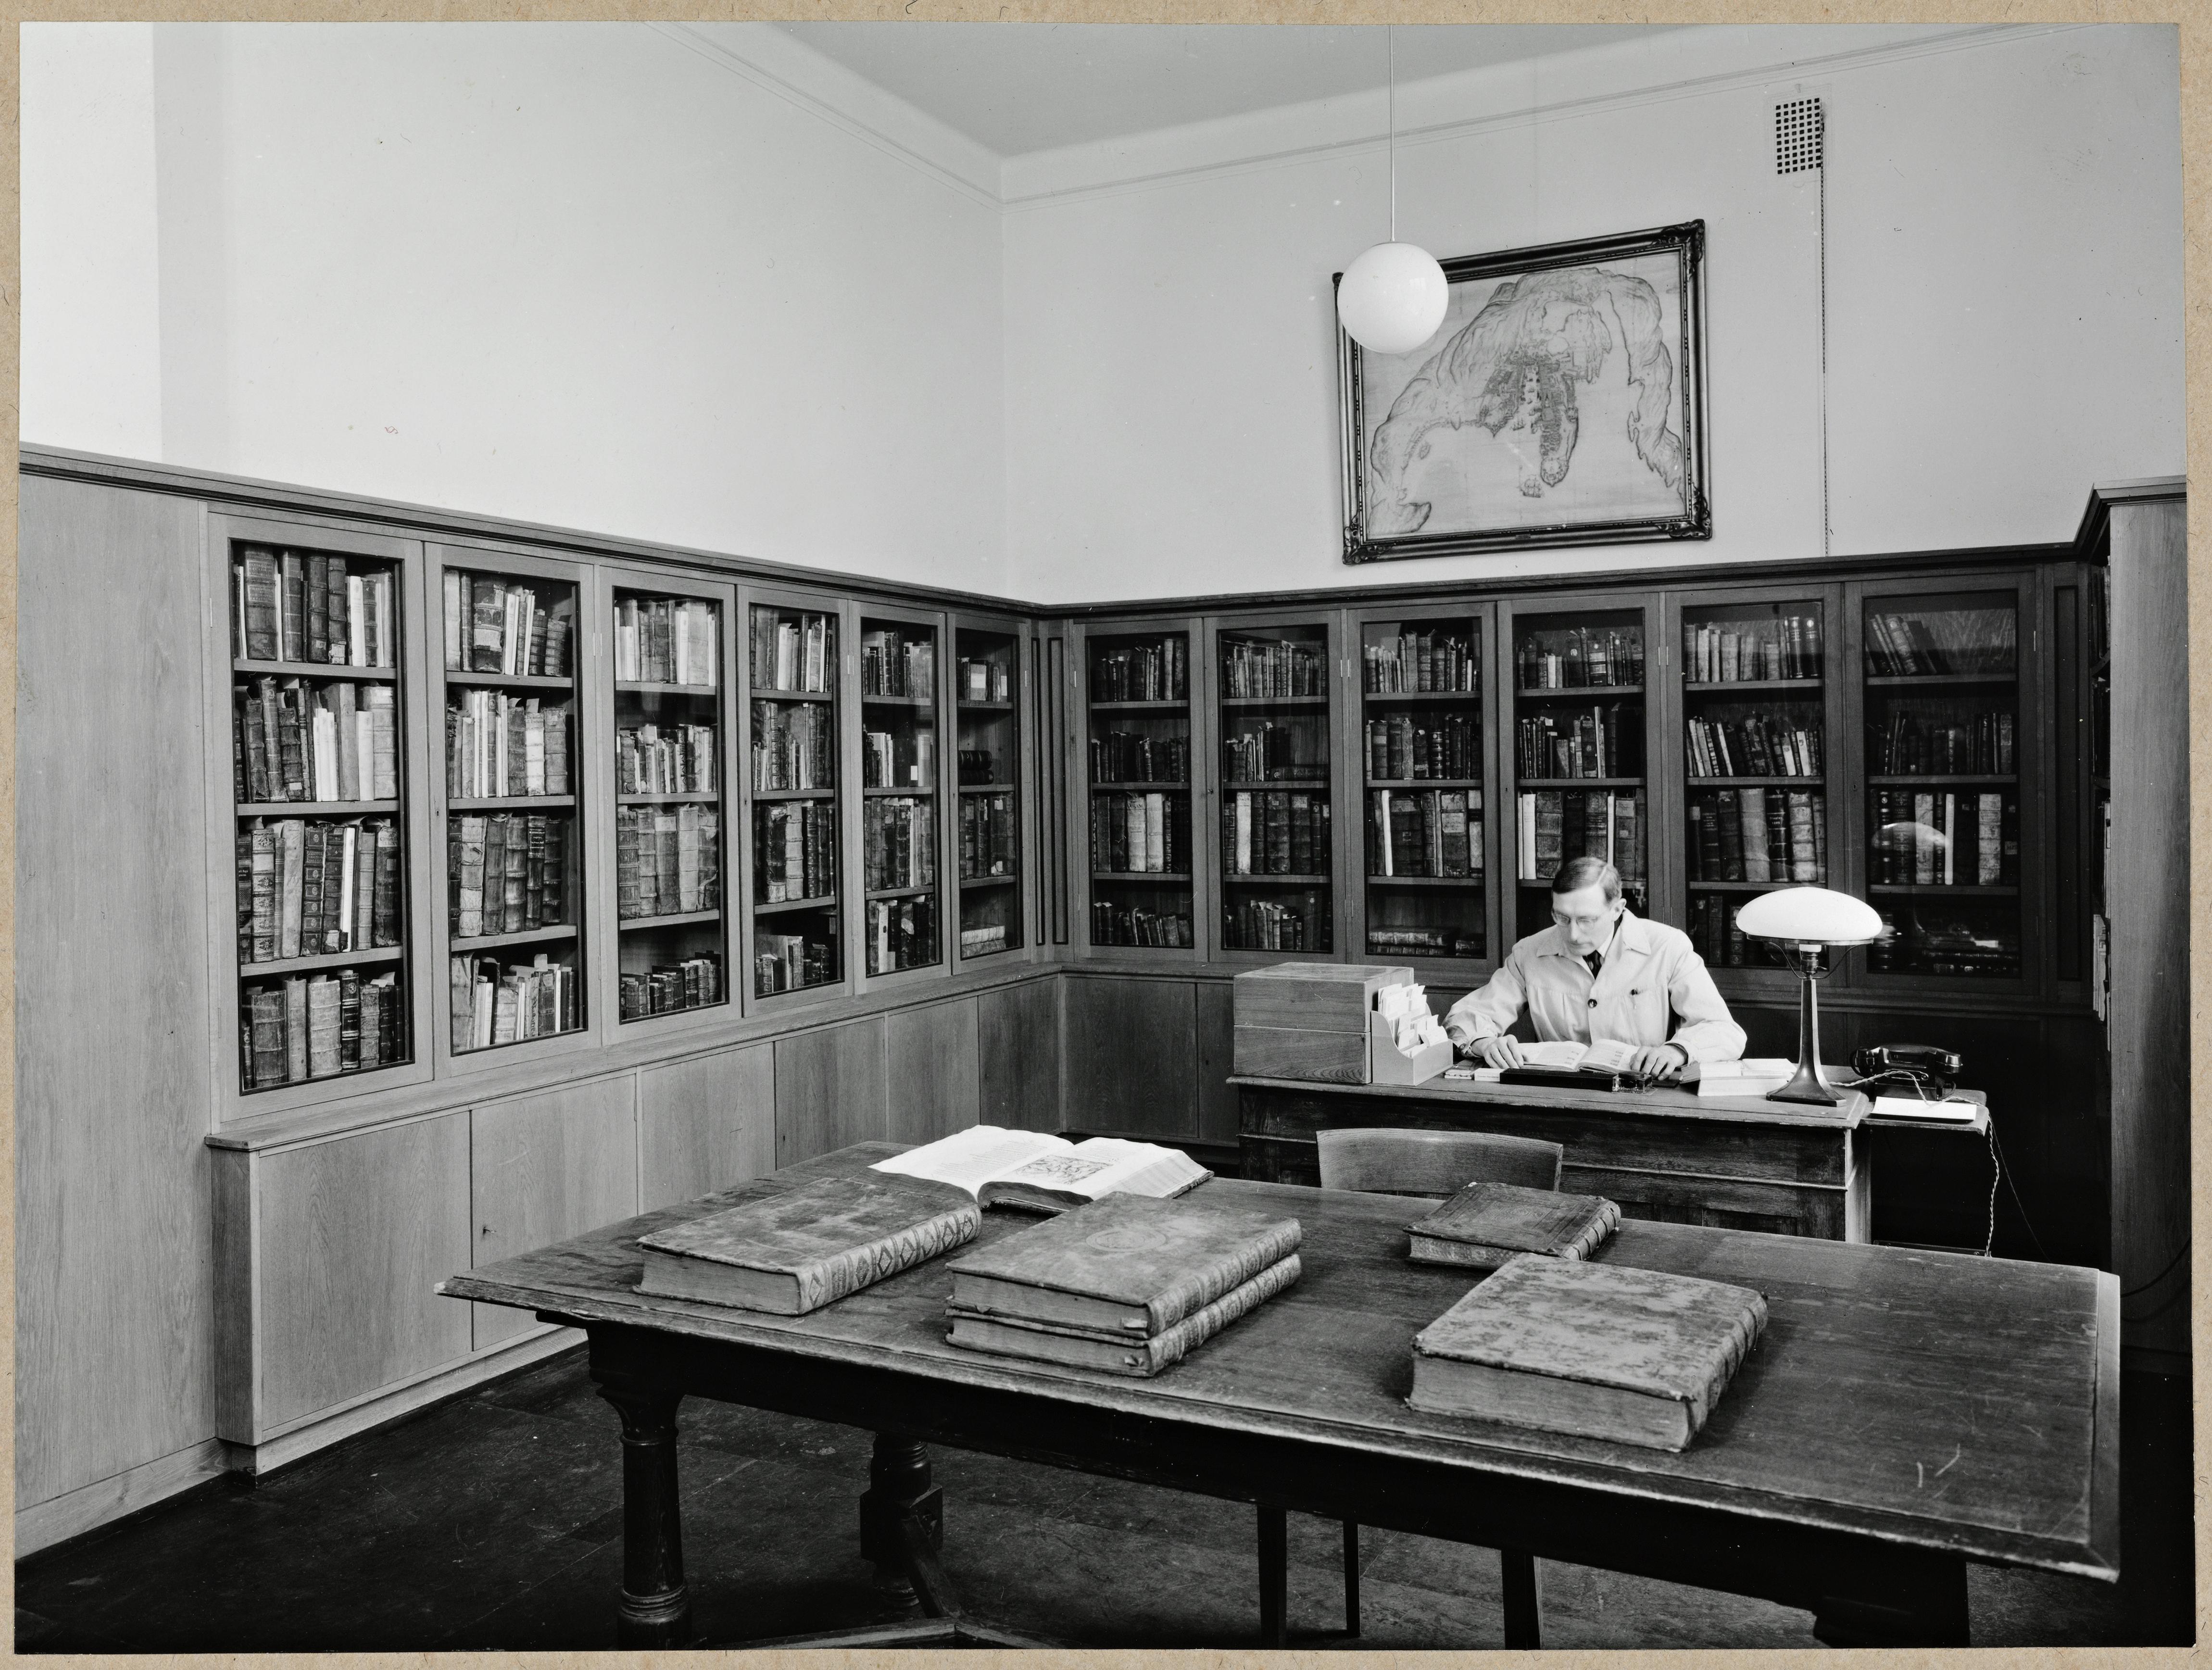 Paleotyprommet, Universitetsbiblioteket